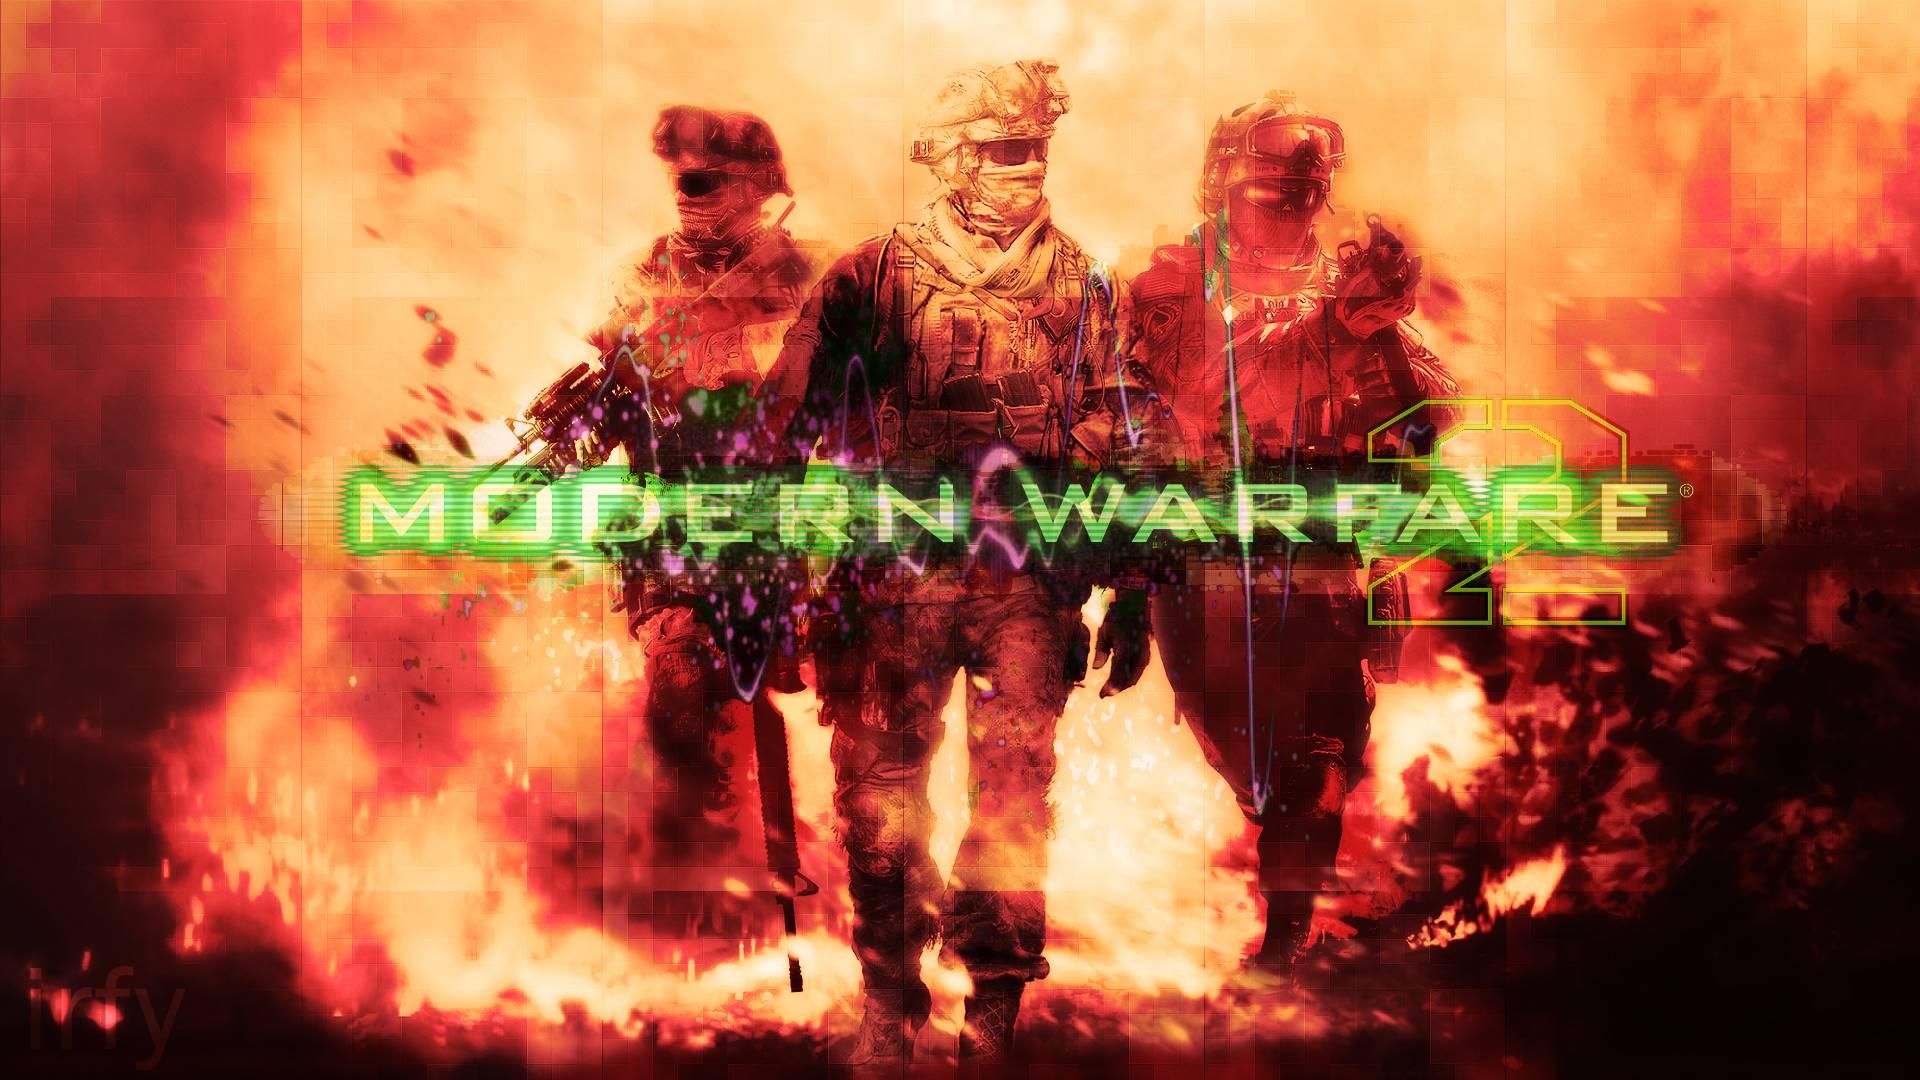 Modern Warfare 2 Wallpaper 1080p 3367 Usbdata